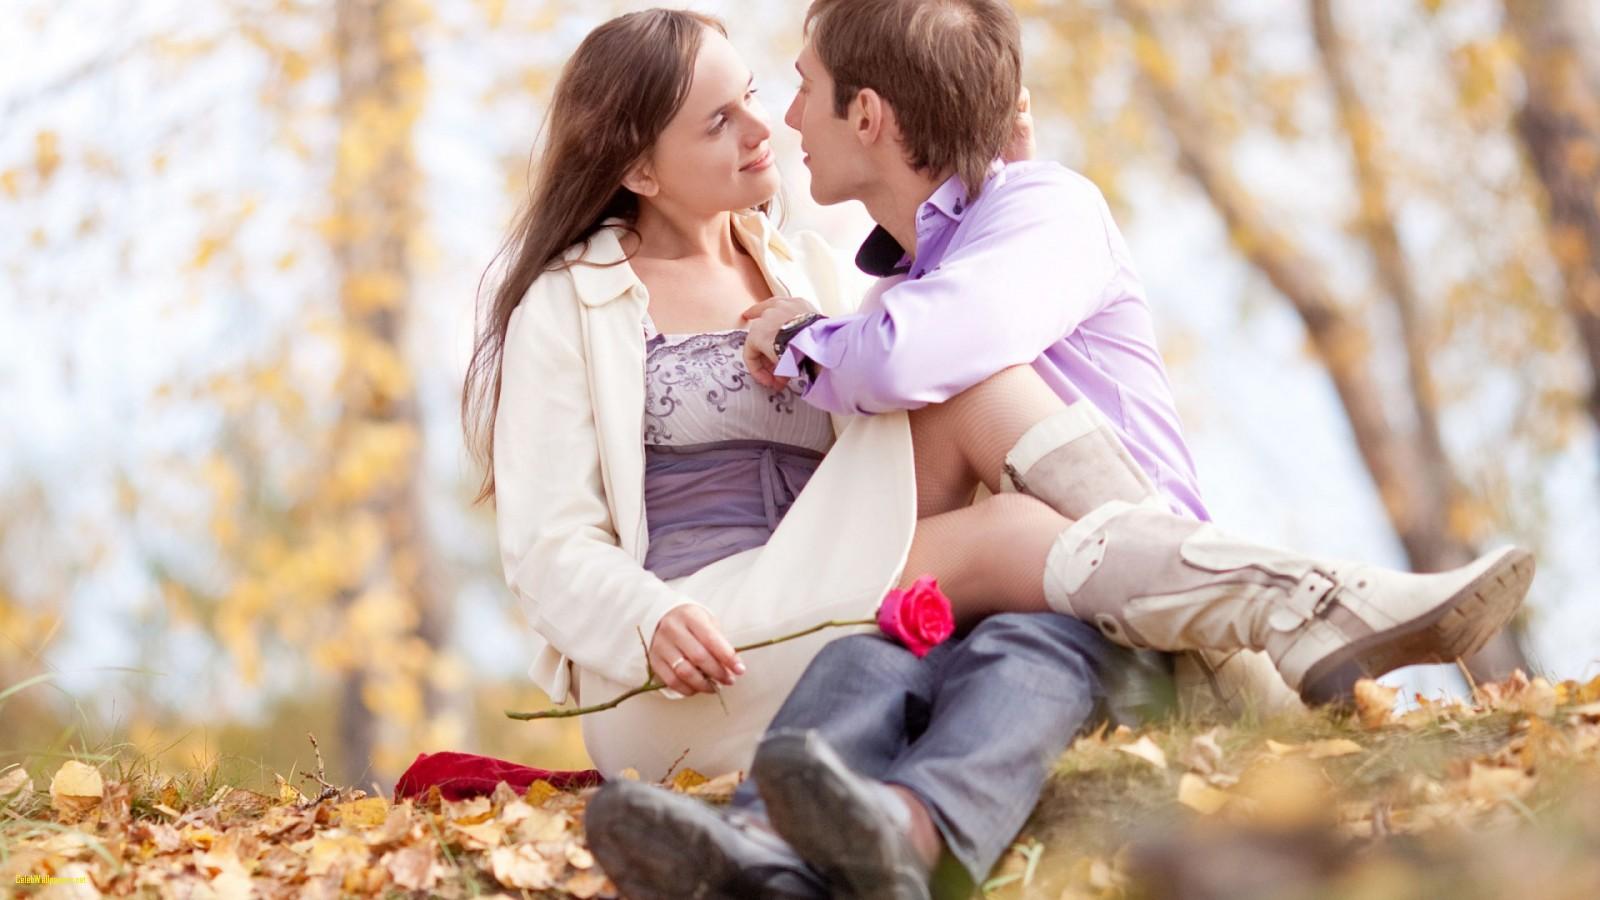 صورة صور حب رومنسي , اجمل صور حب رومنسى 690 5